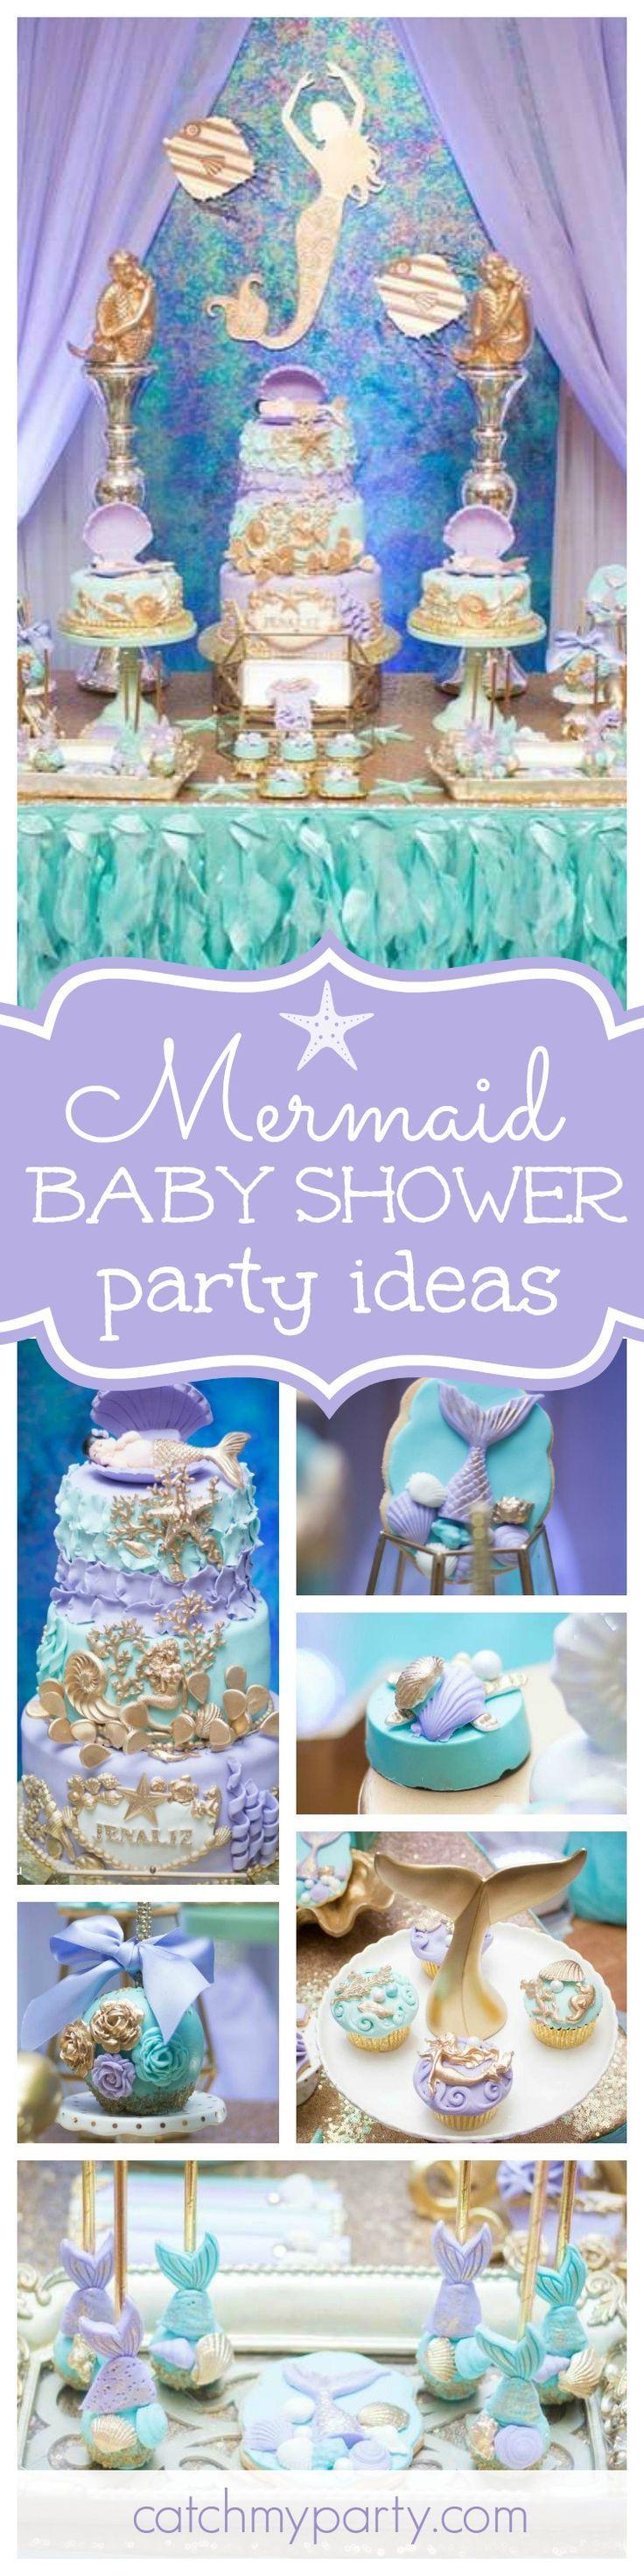 123 best A Baby Shower images on Pinterest | Little golden books ...